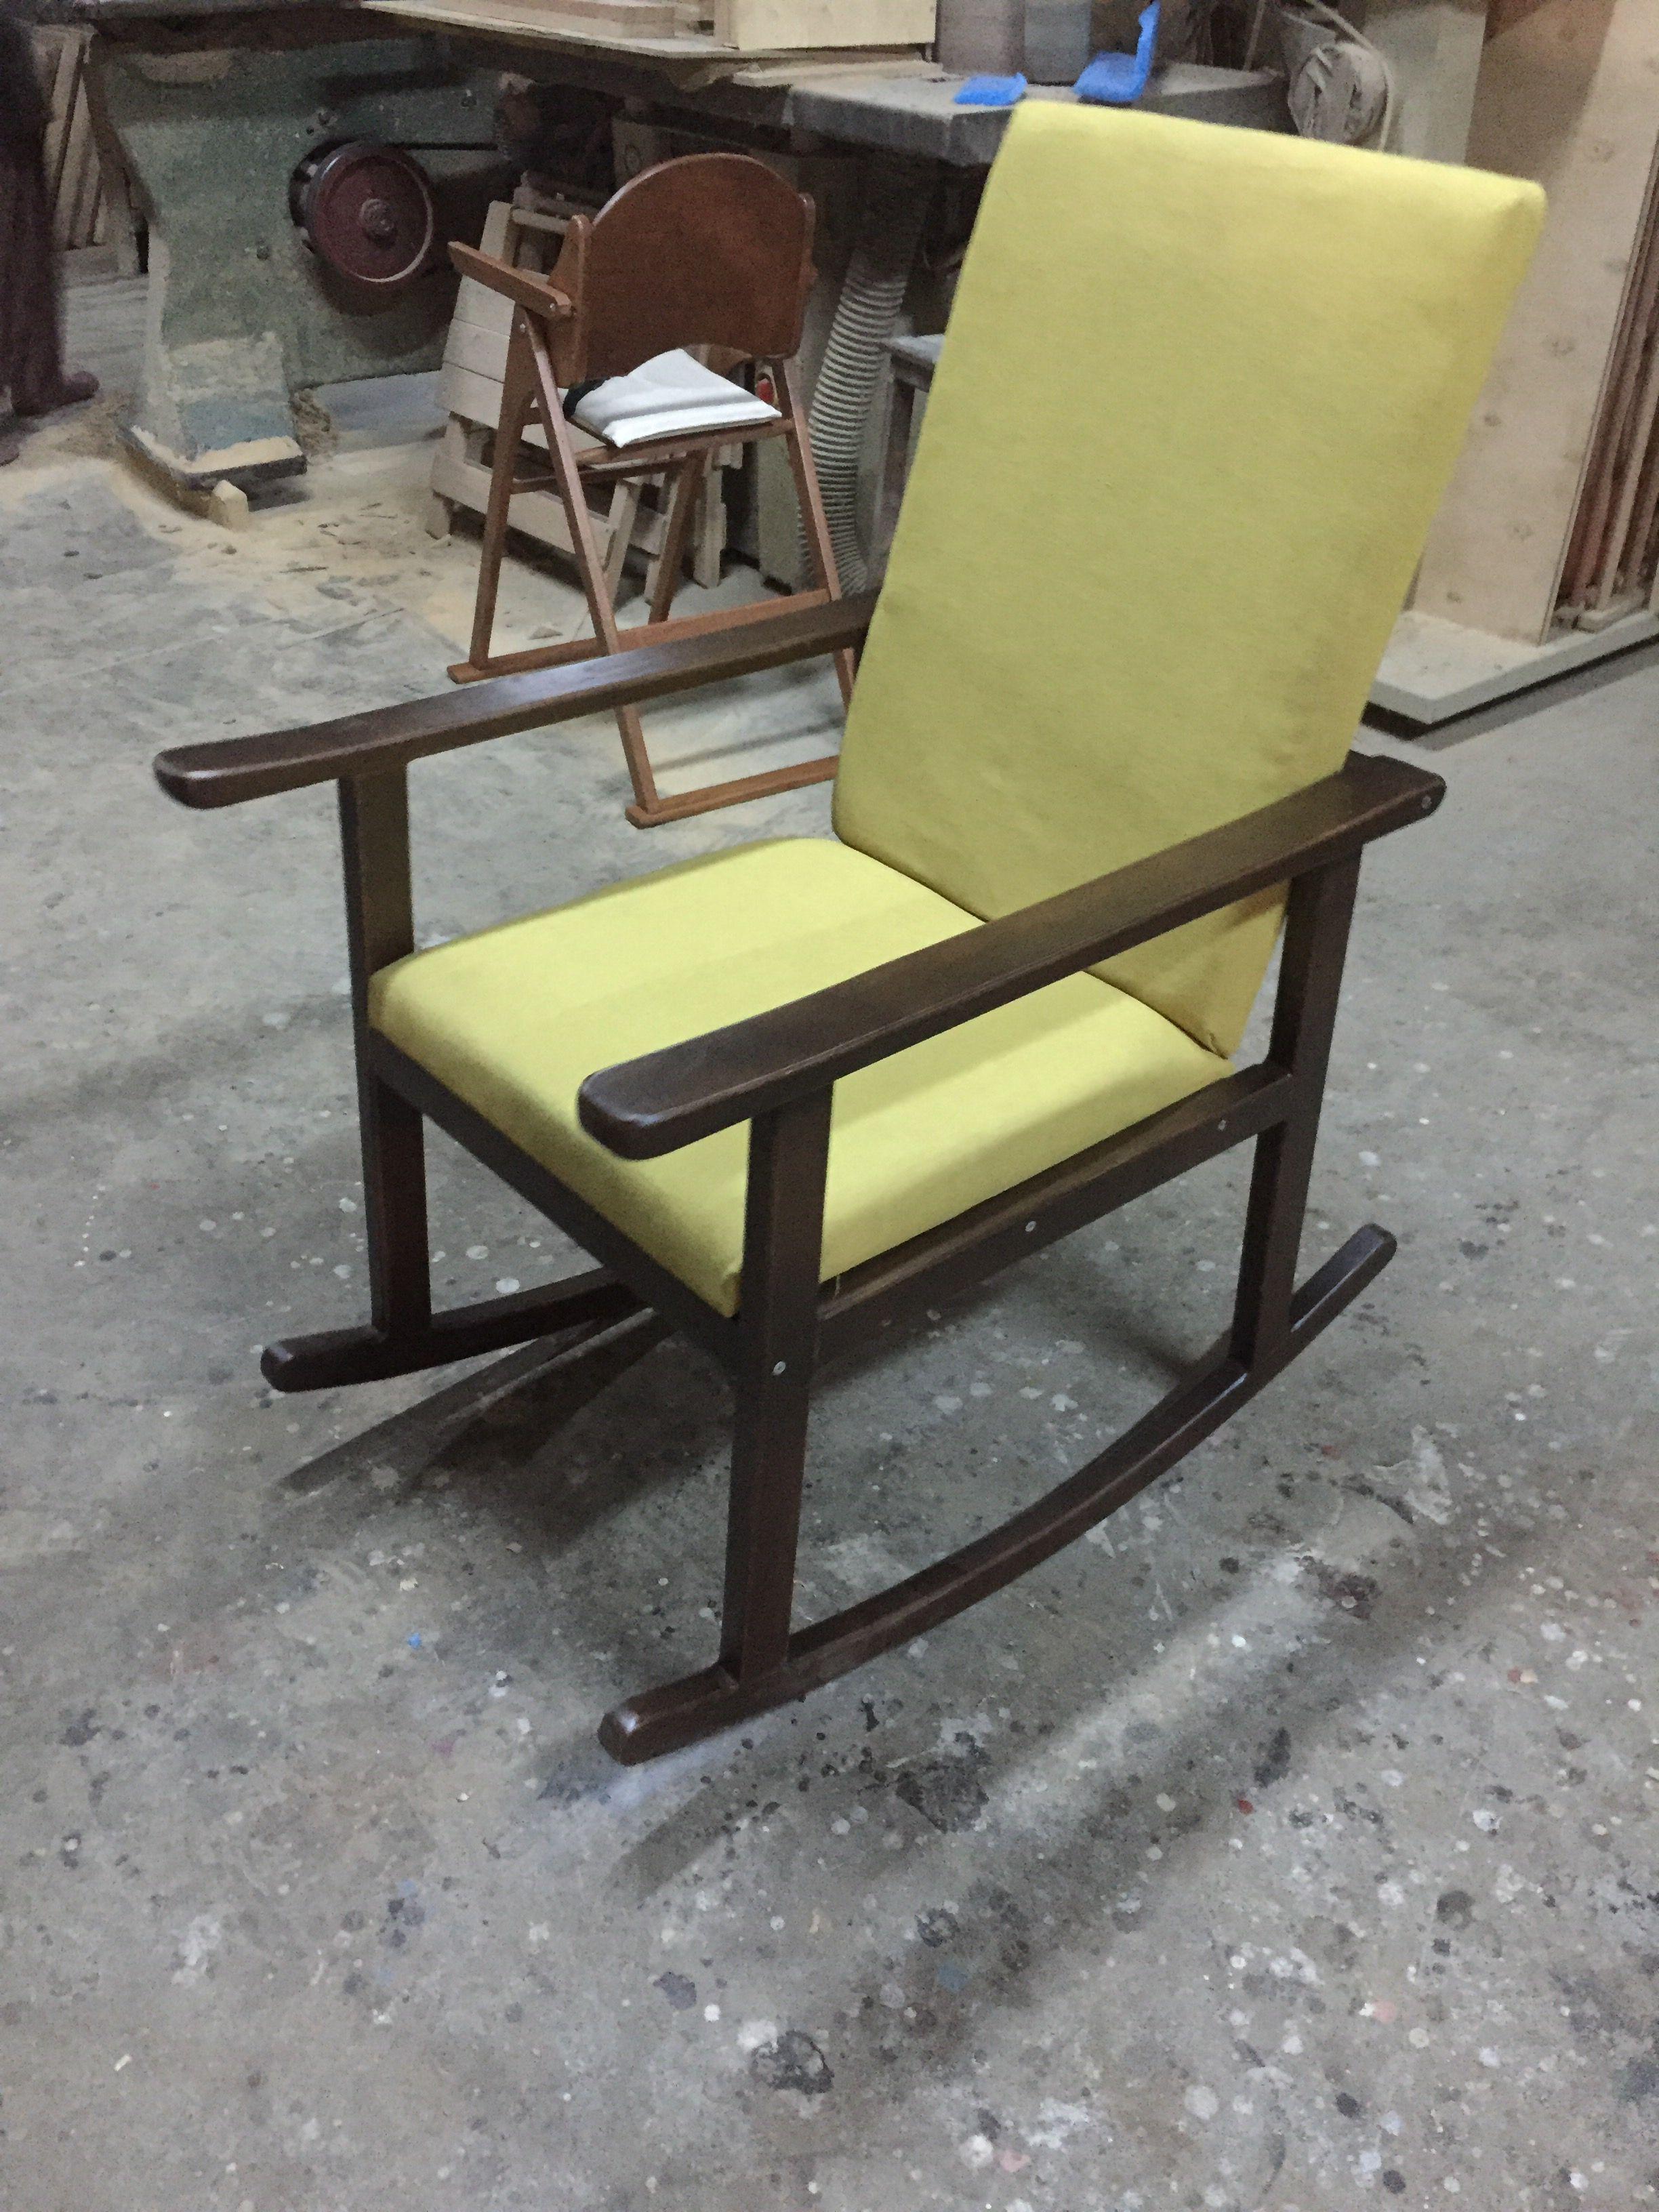 Ahsap Sallanan Sandalye Imalati Kolay Ahsap Projeleri Sandalye Ahsap Projeleri